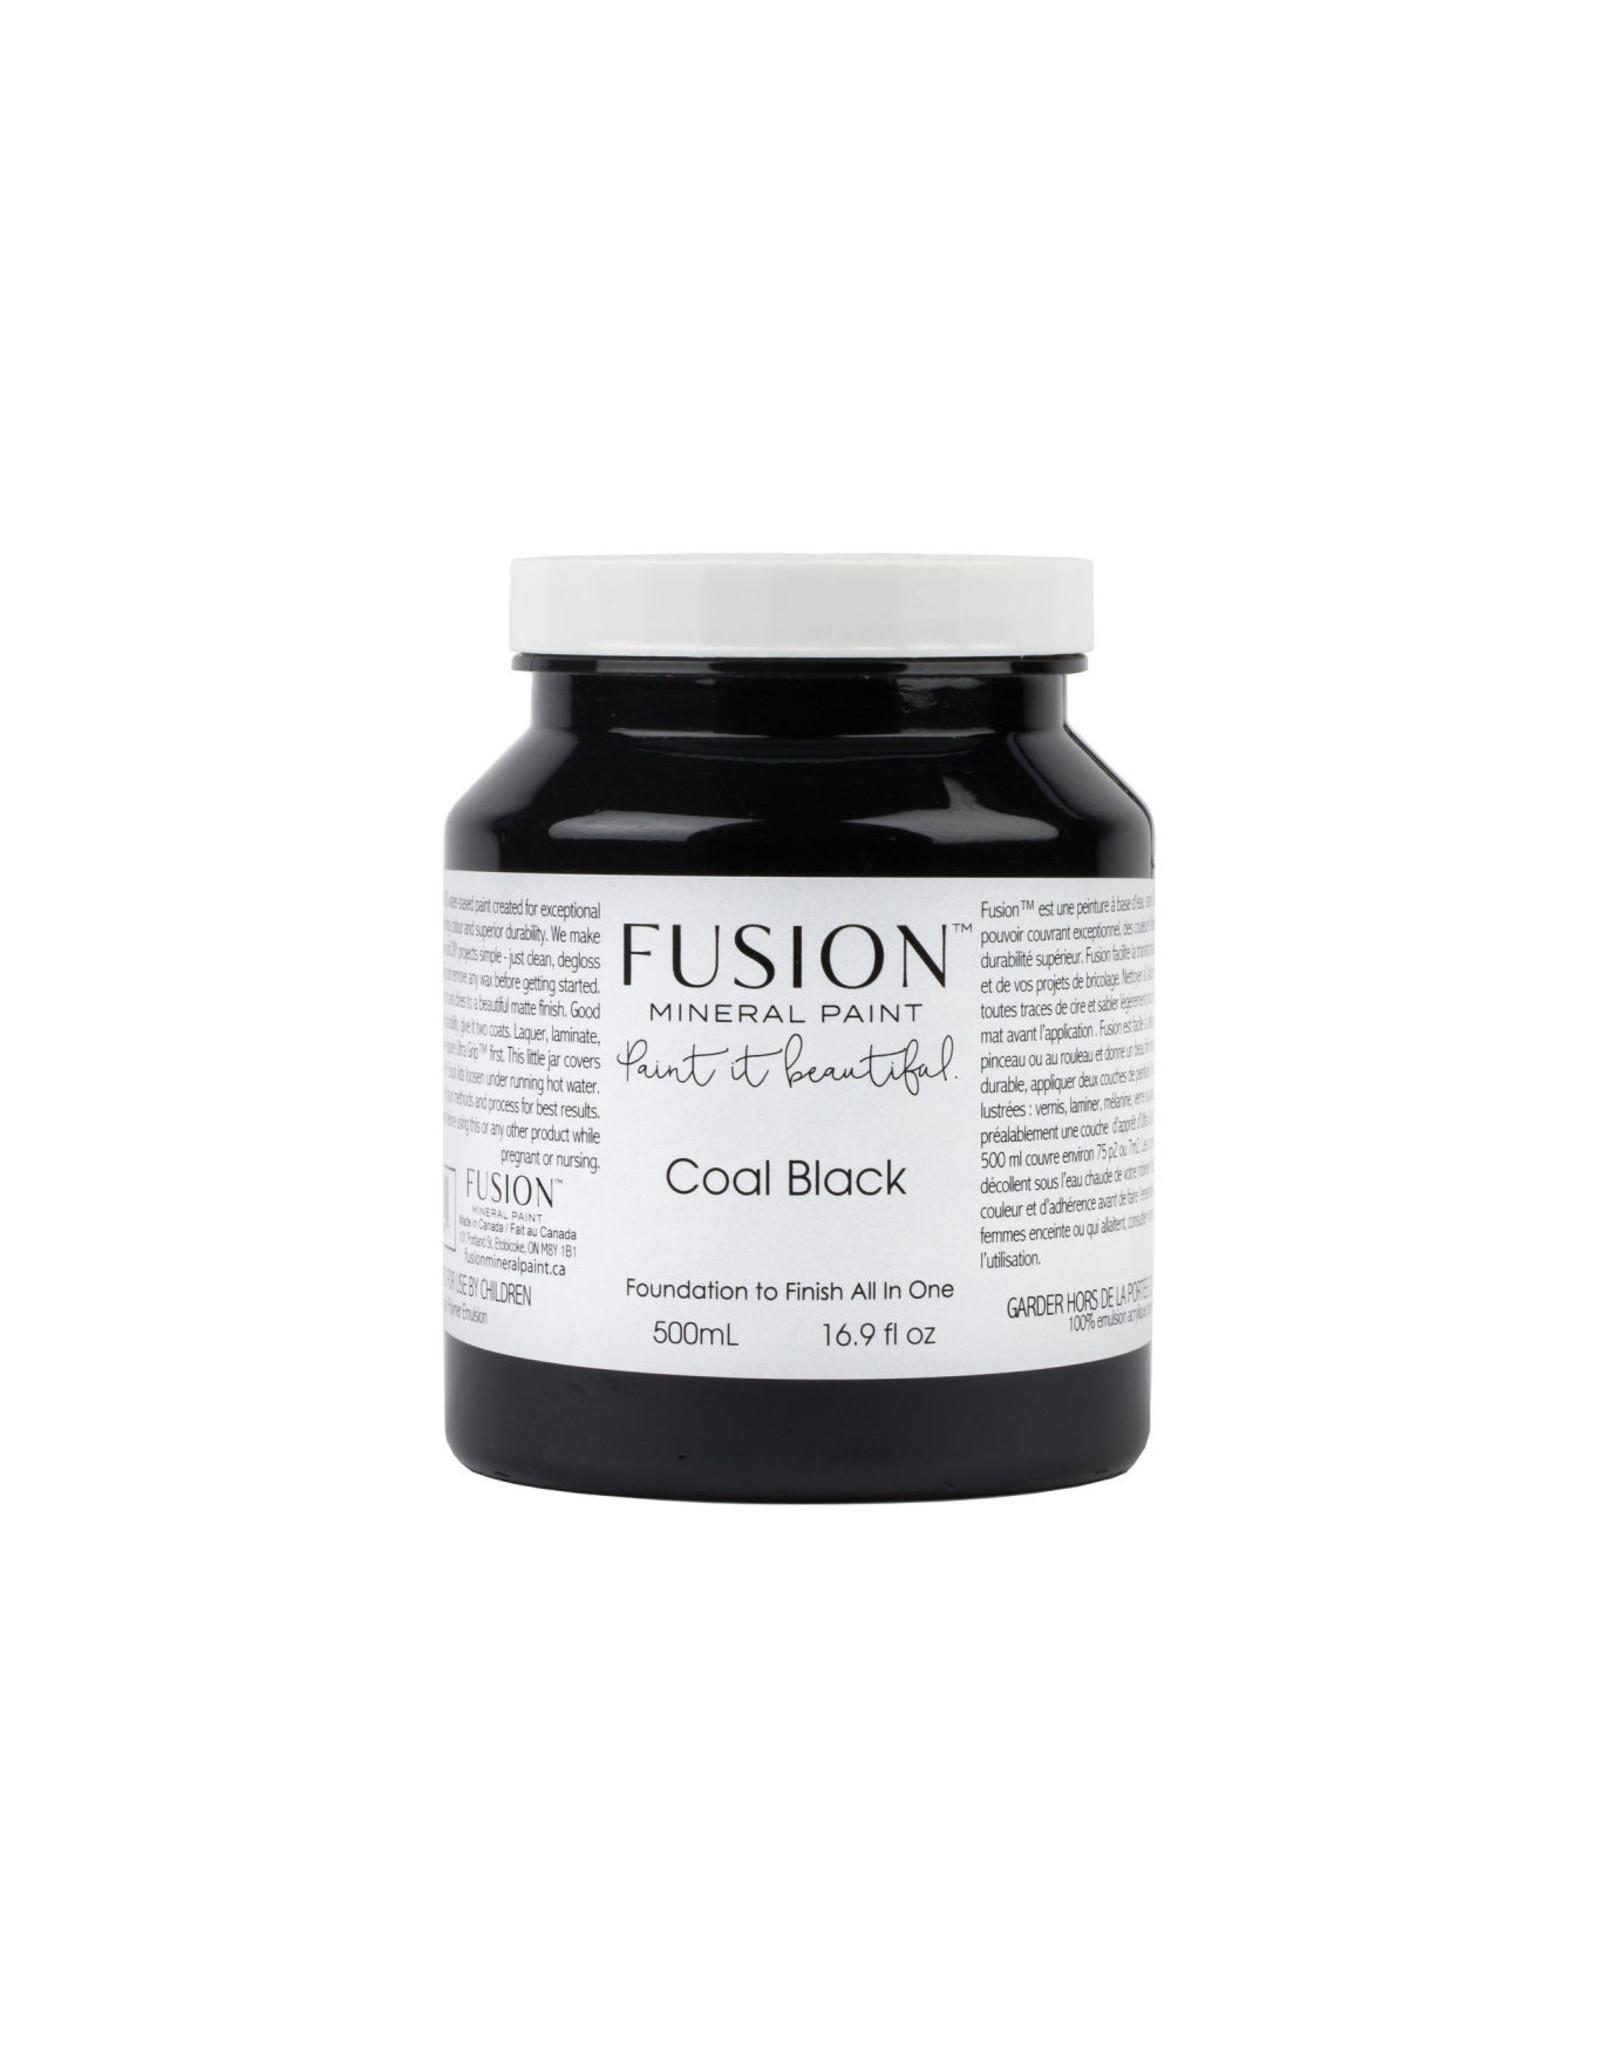 Fusion Mineral Paint Fusion Mineral Paint - Coal Black 500ml